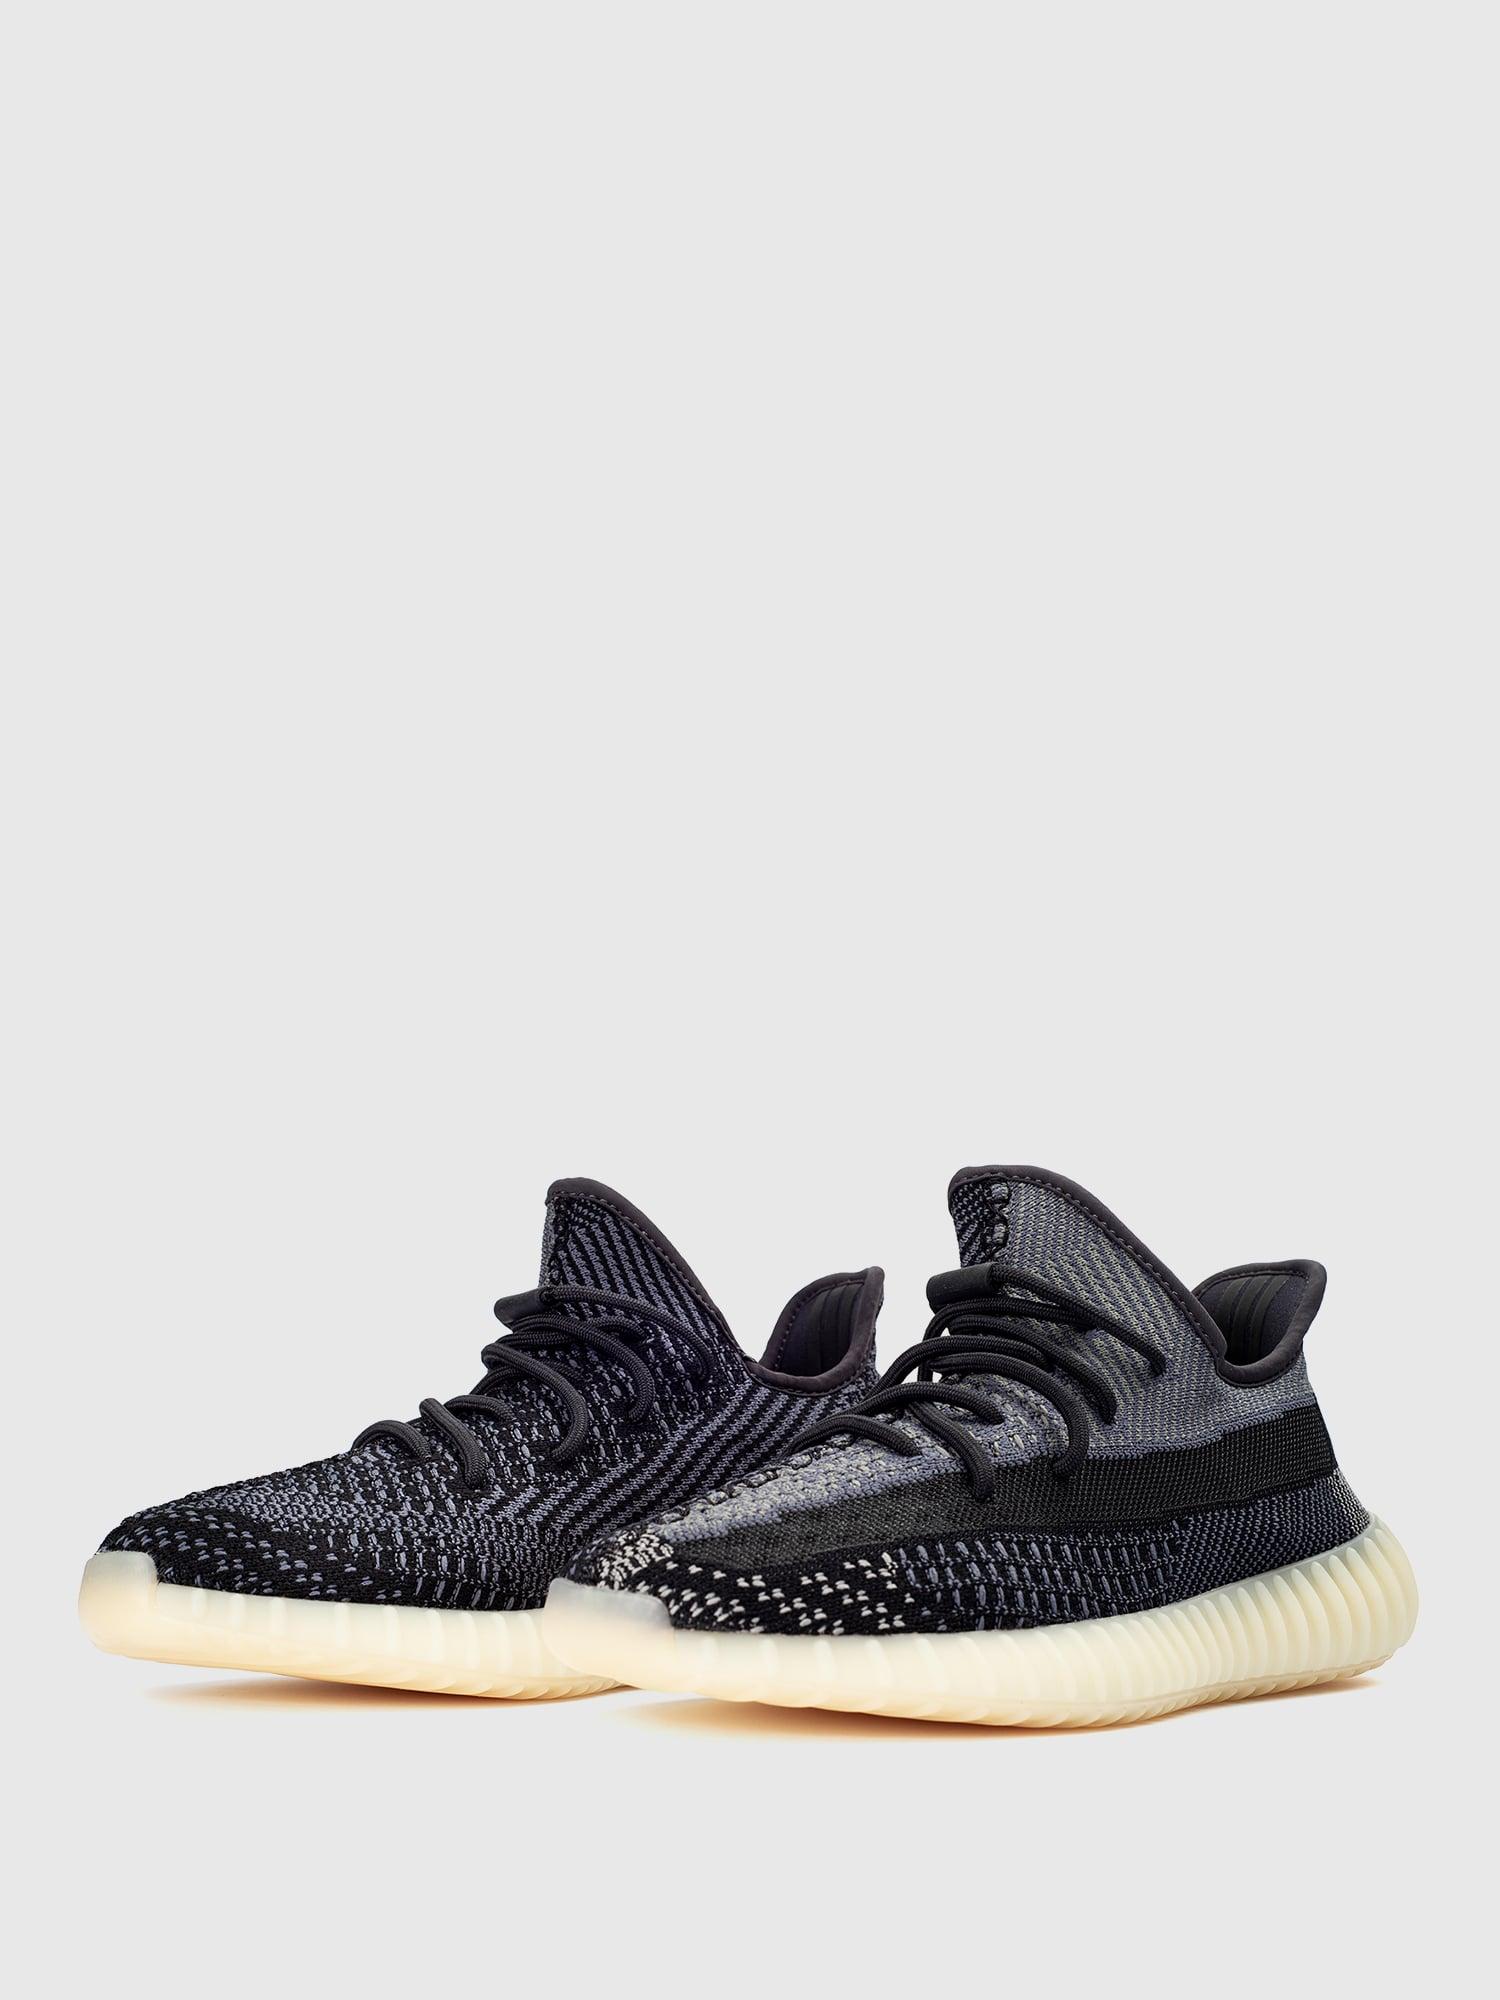 Adidas Yeezy Boost 350 V2 'Carbon'